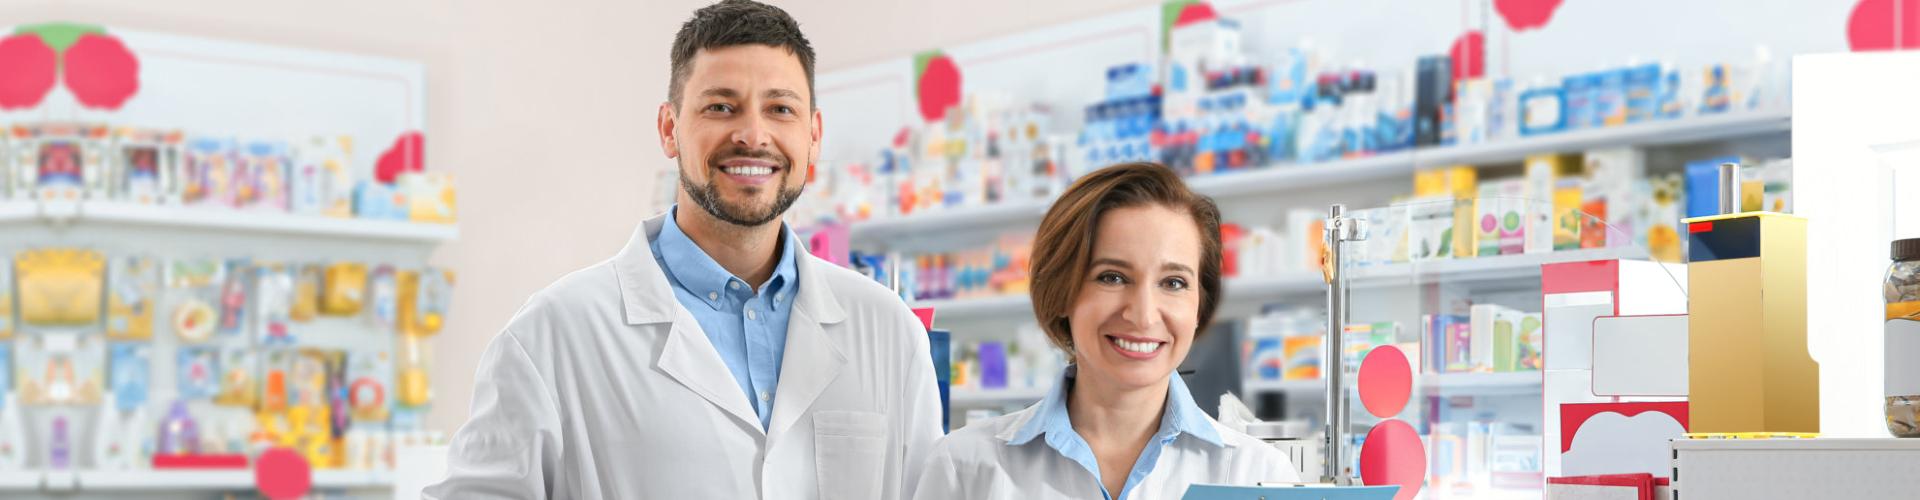 female and male pharmacists